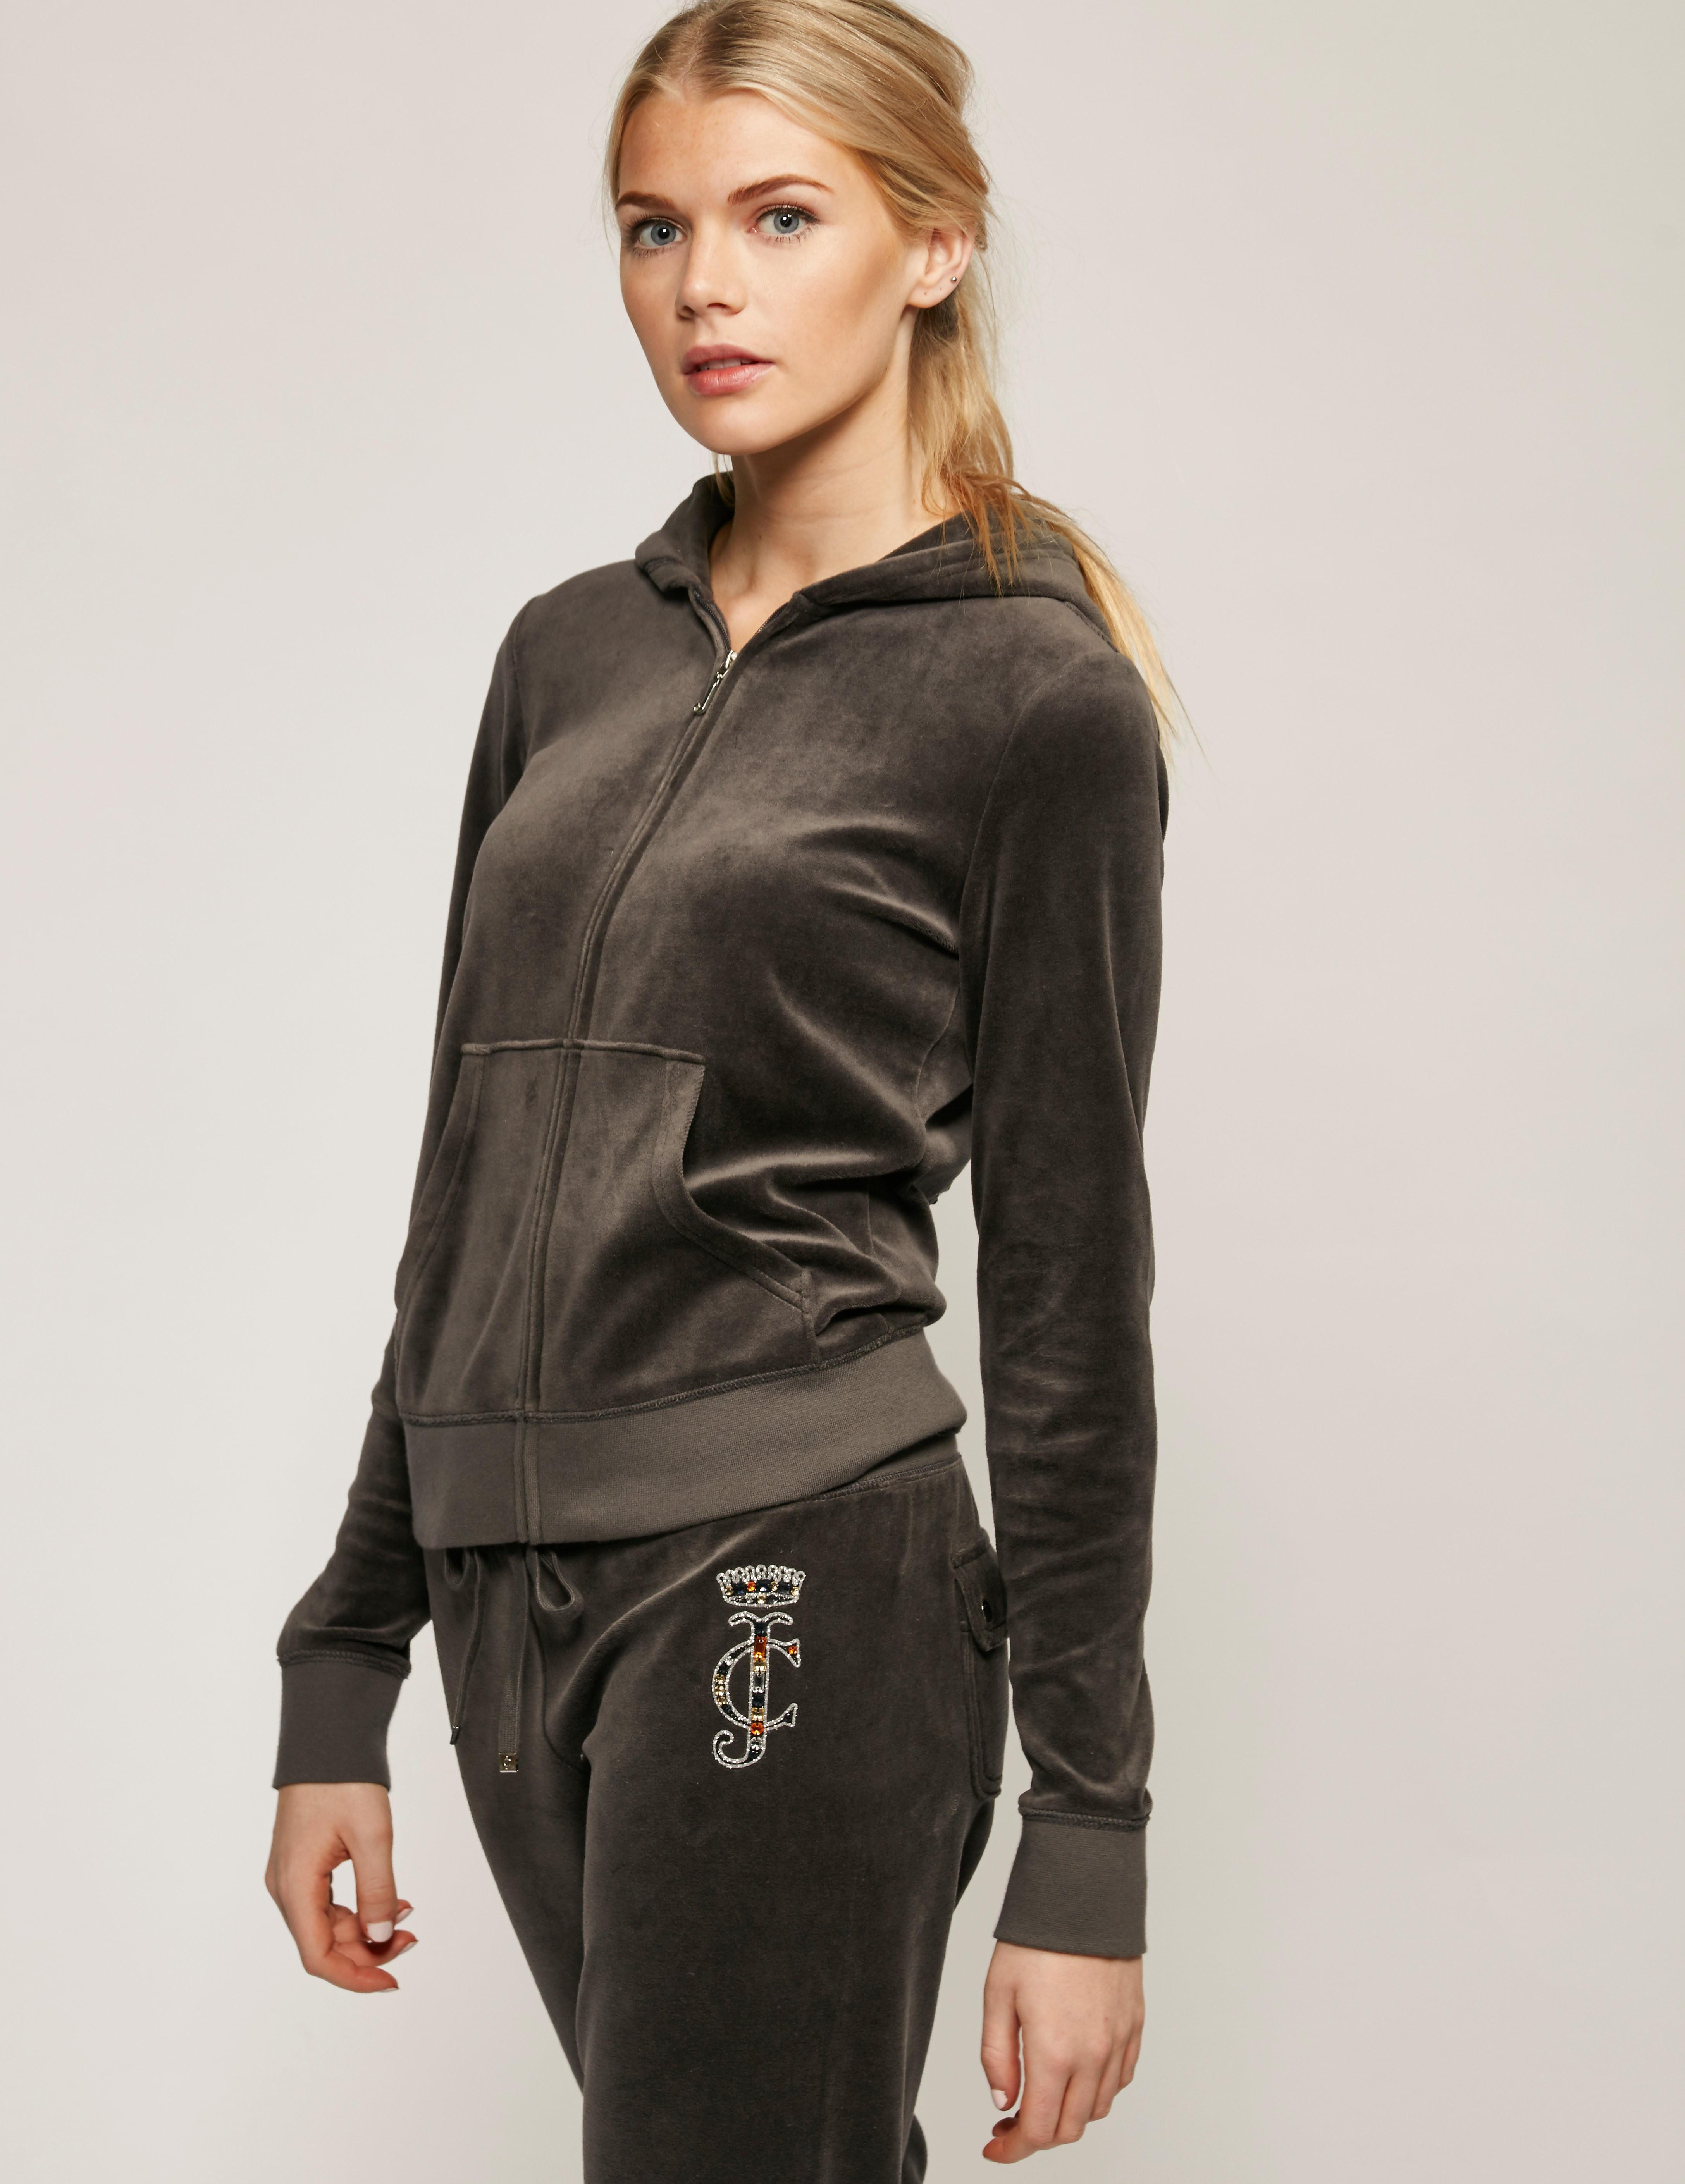 Juicy Couture Jewel Logo Jacket